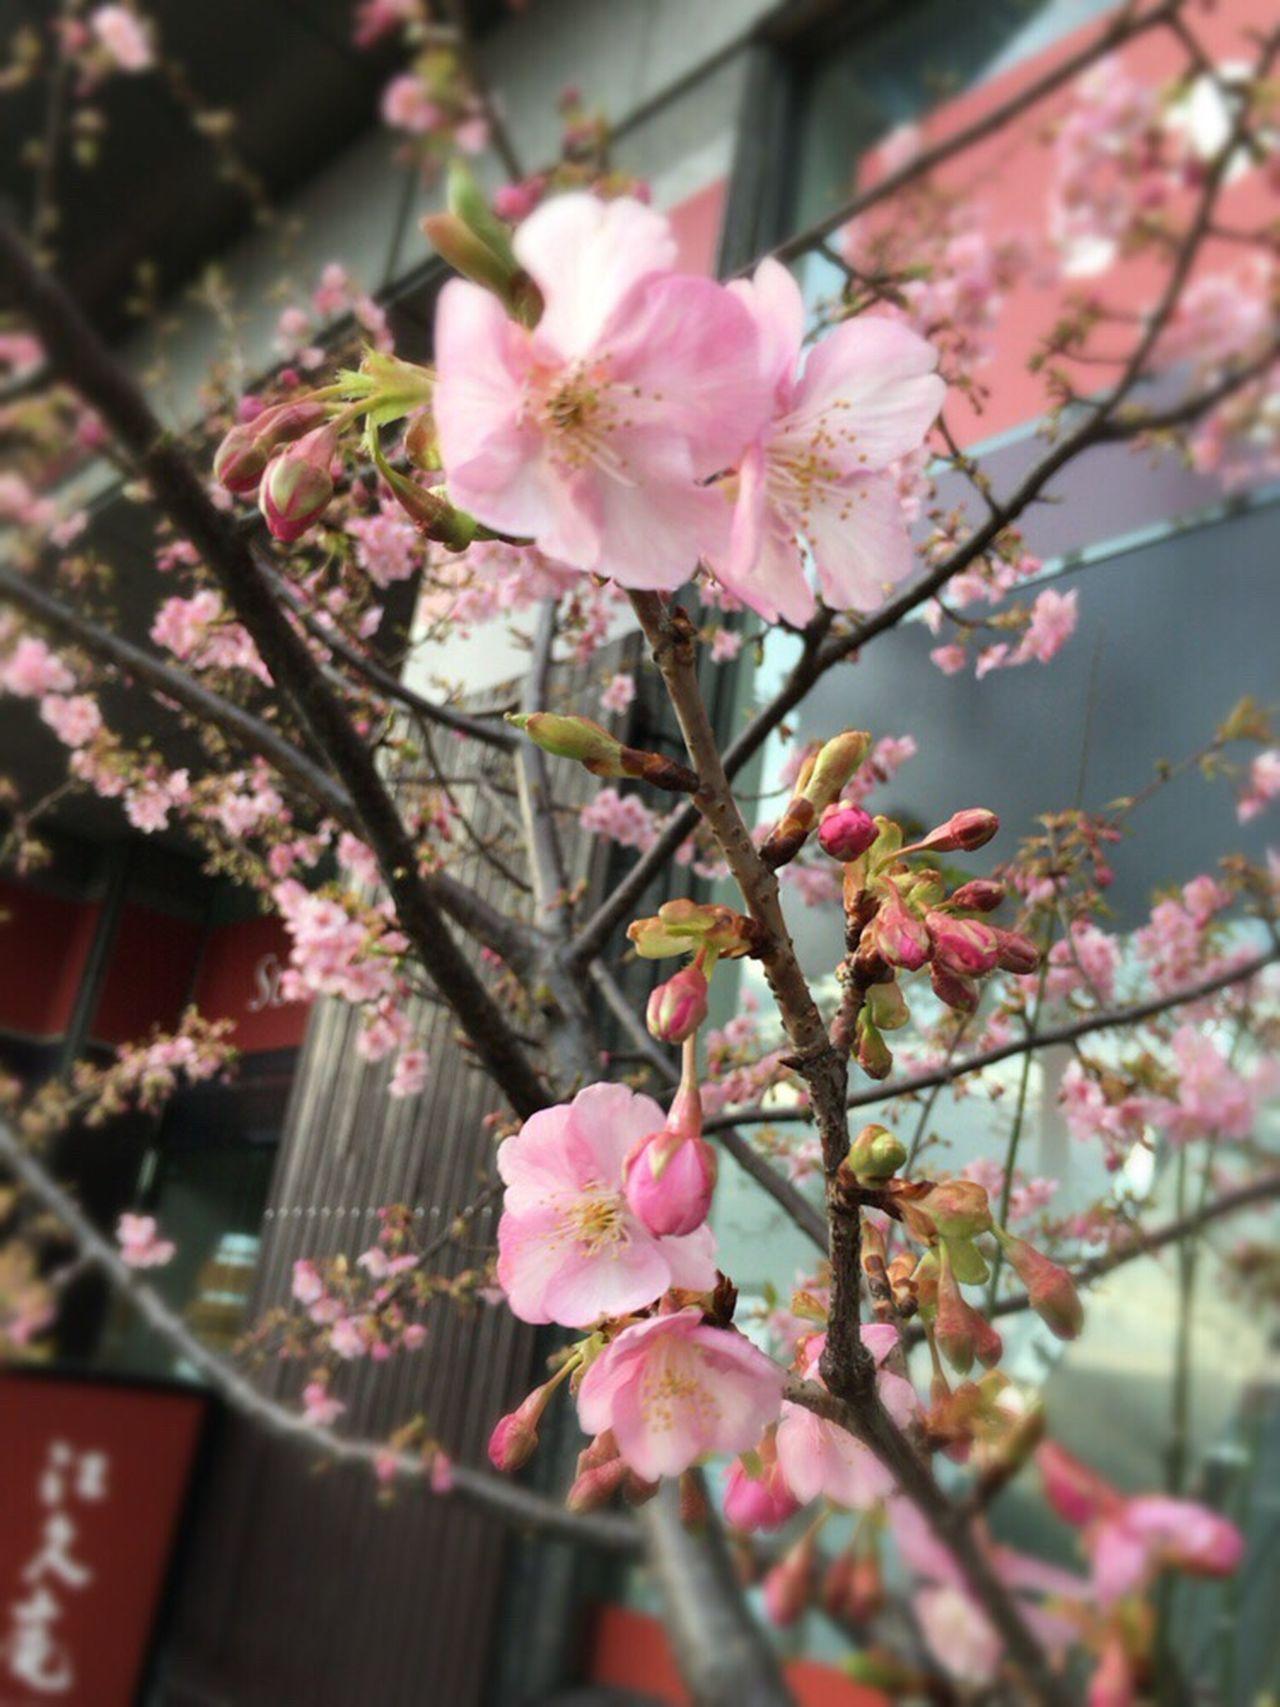 Kyoto Sakura 2017 Kyoto Sakura Kyoto Spling Kyoto Spling Flower Sakura 2017 Kyoto Cherry Blossom Cherry Blossoms Kyoto,japan Sakura Cherry Blossom Kyoto City